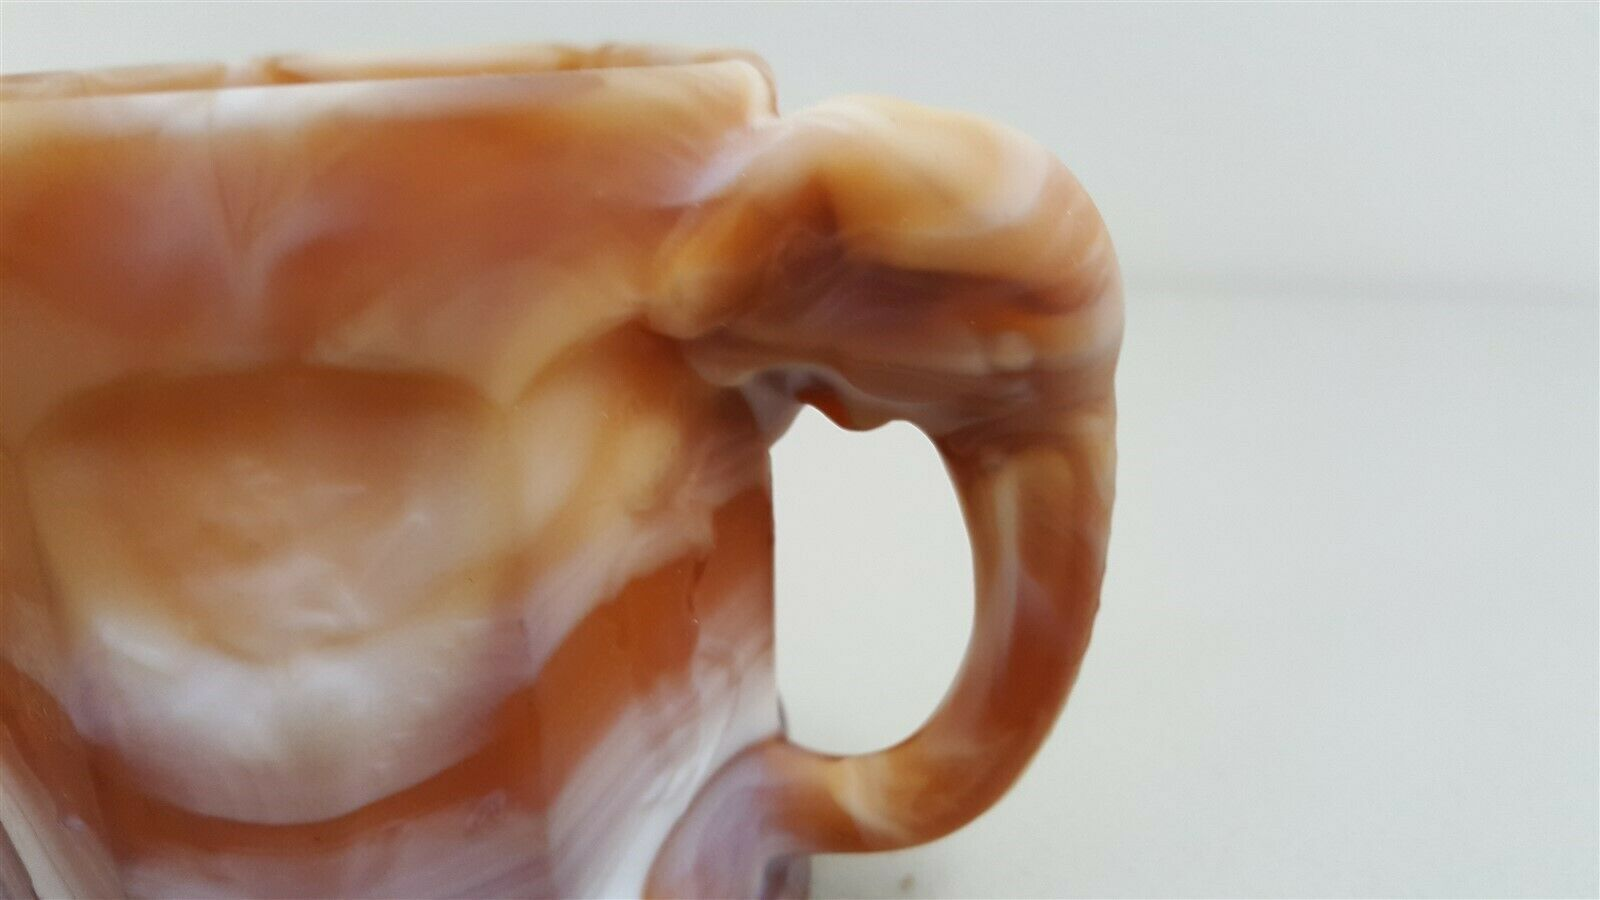 Imperial IG CARAMEL CHOCOLATE Slag Child's Elephant Handle Nursery Rhyme Mug